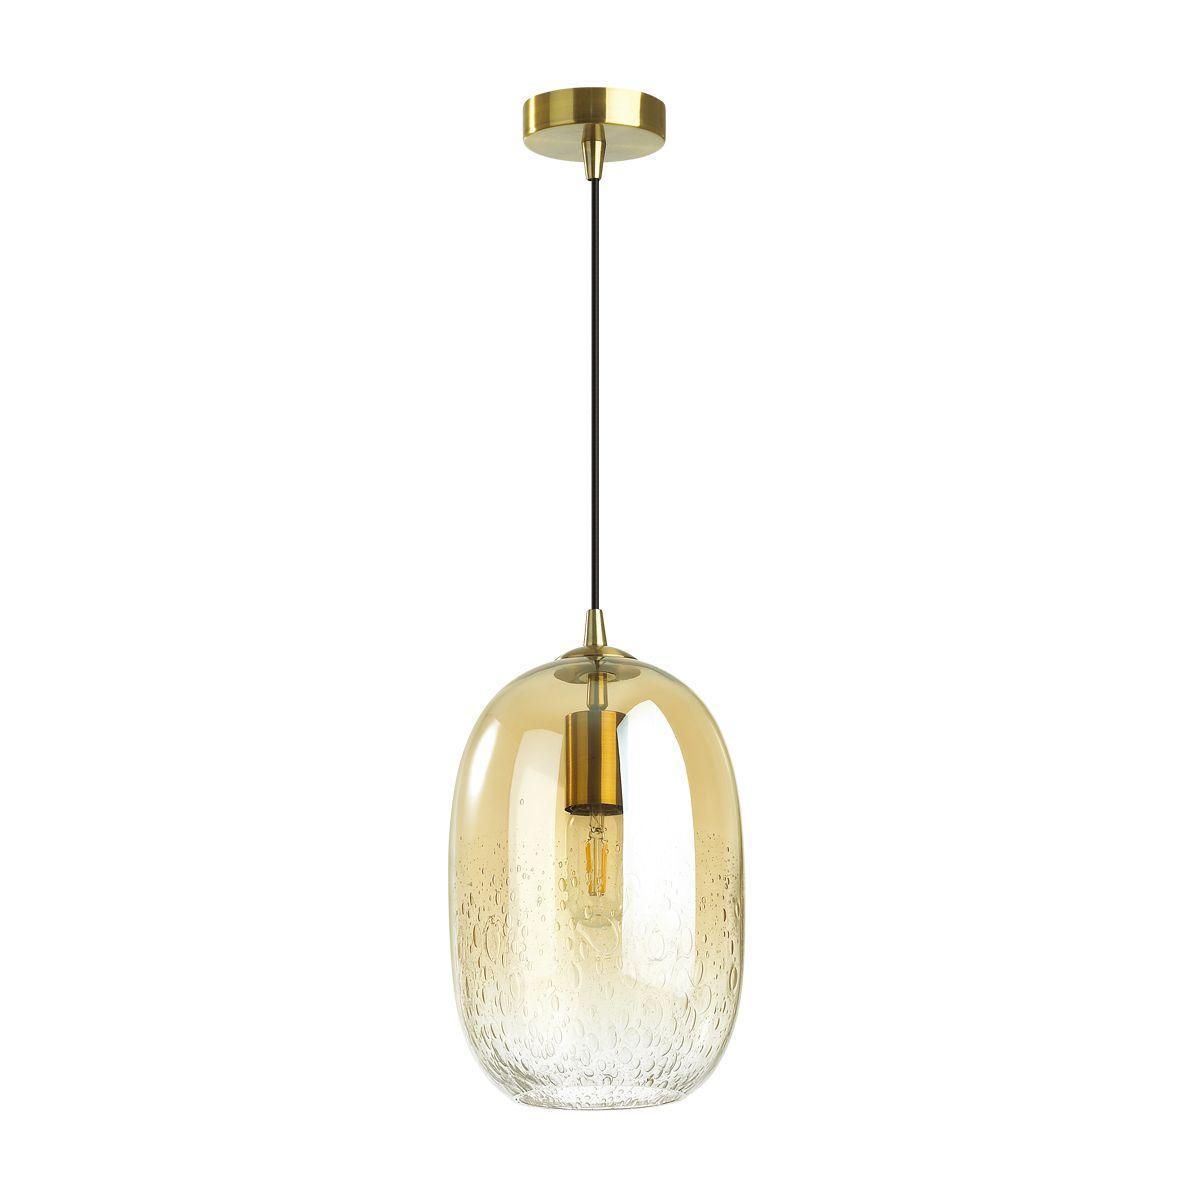 Подвесной светильник Odeon Light Airly 4819/1